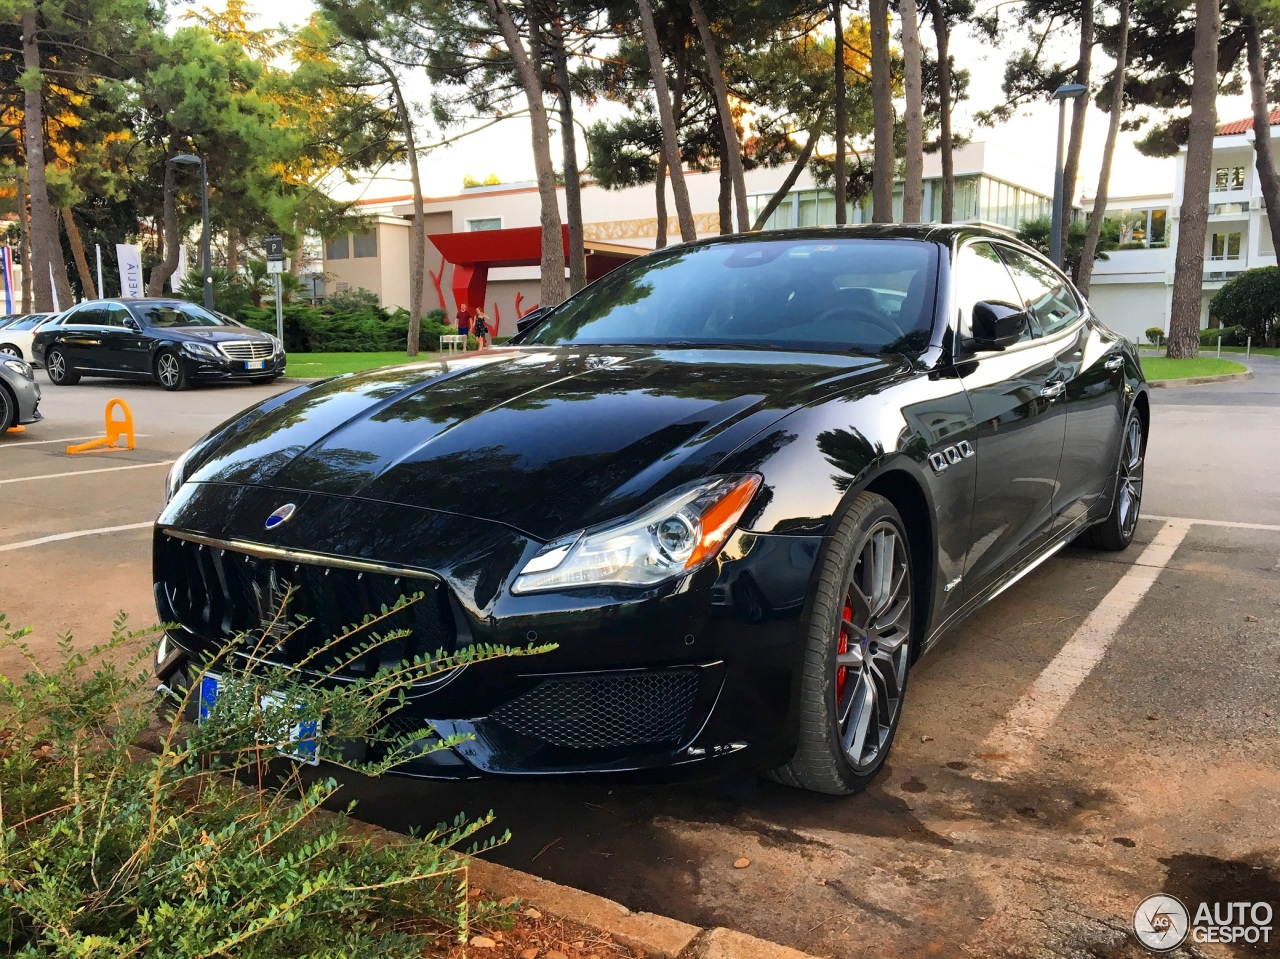 Maserati Quattroporte S GranSport - 21 August 2017 - Autogespot